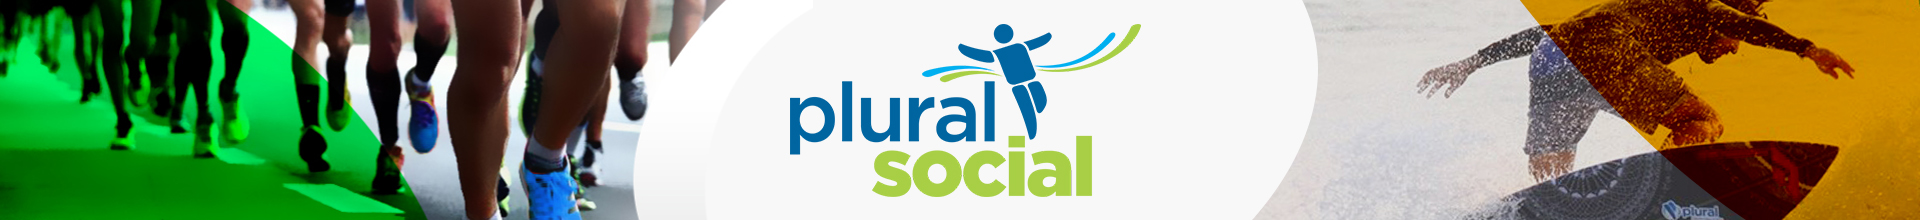 Plural Social - Patrocínio do Surf 11